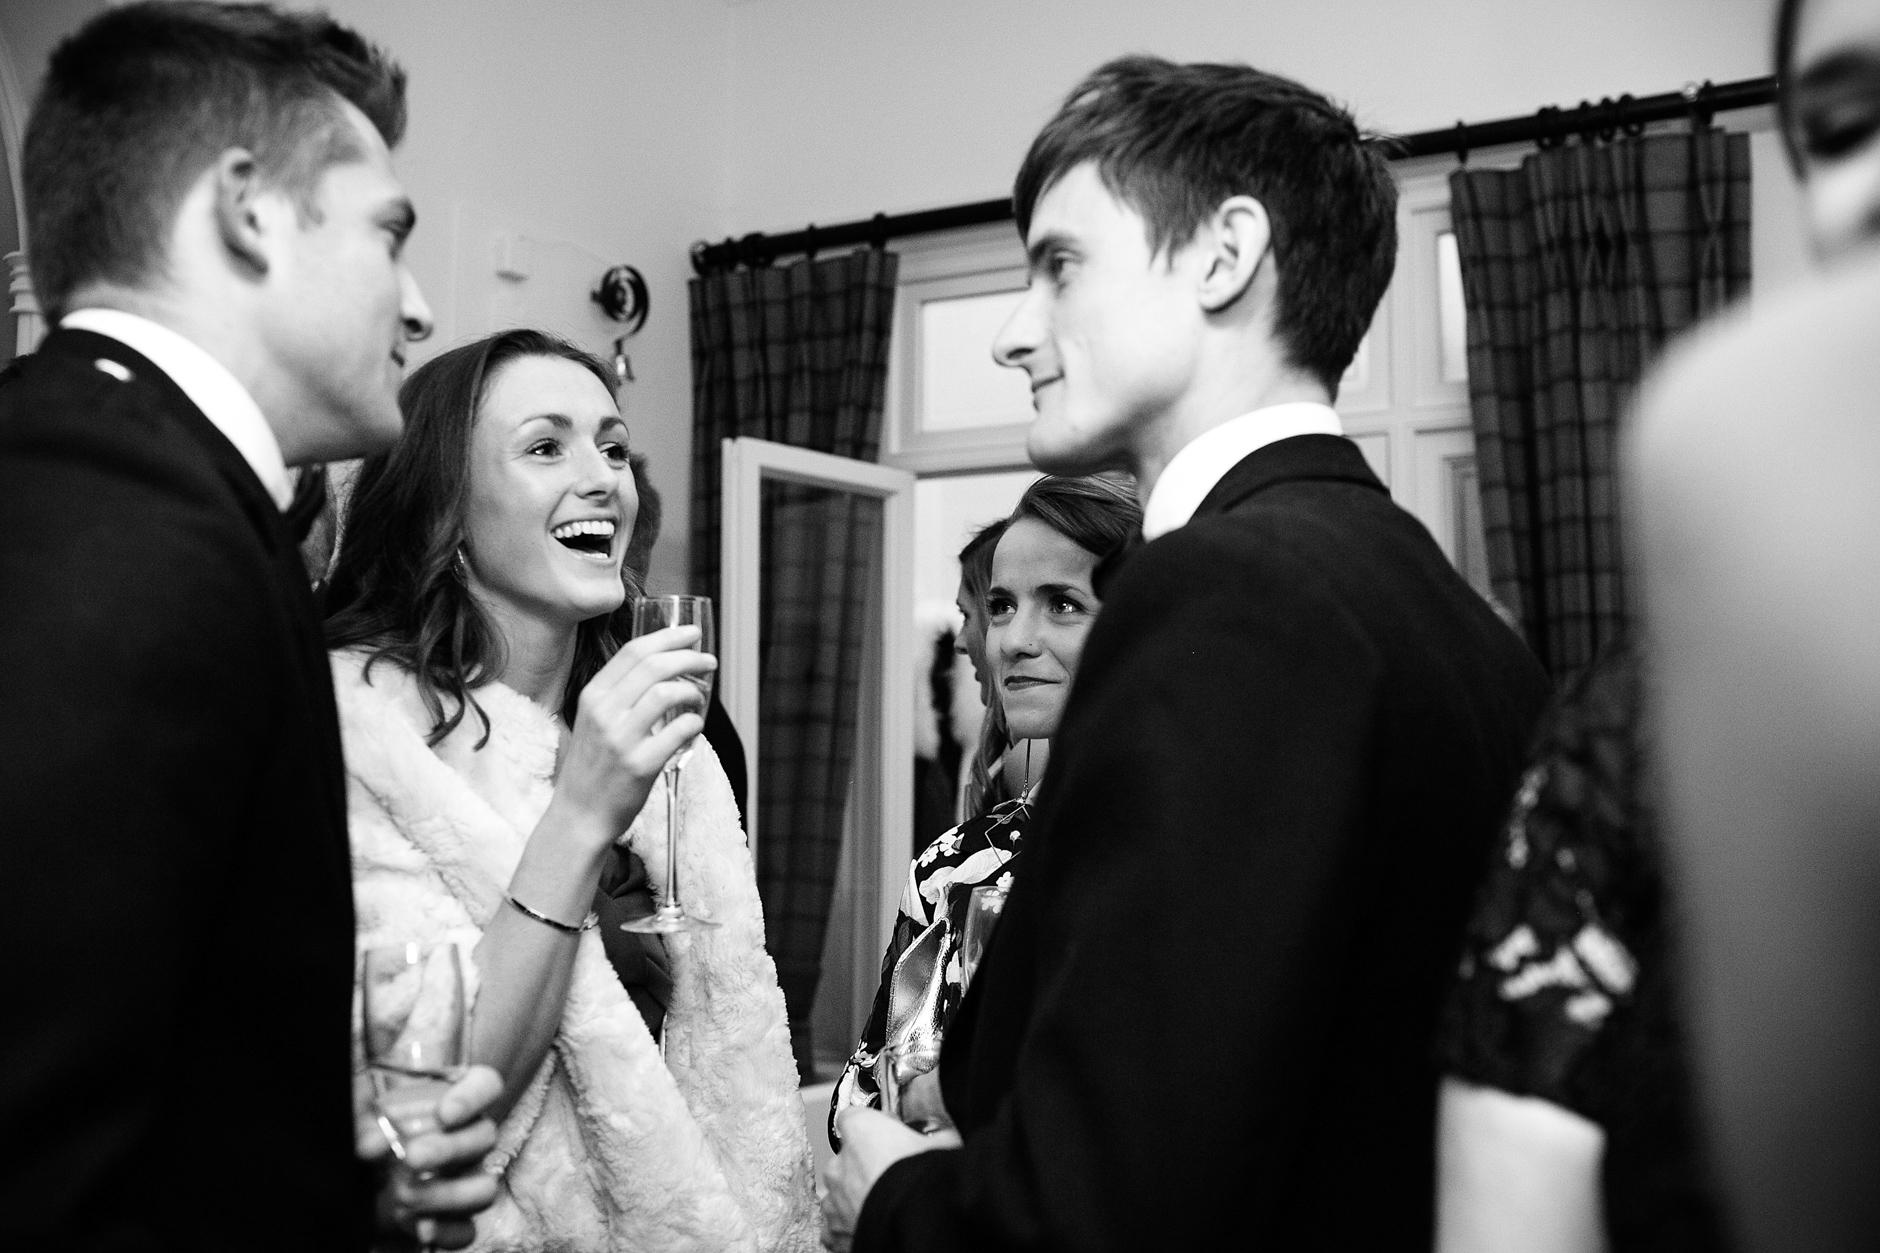 Glentruim-Wedding-Nikki-Leadbetter-Photography-247.jpg